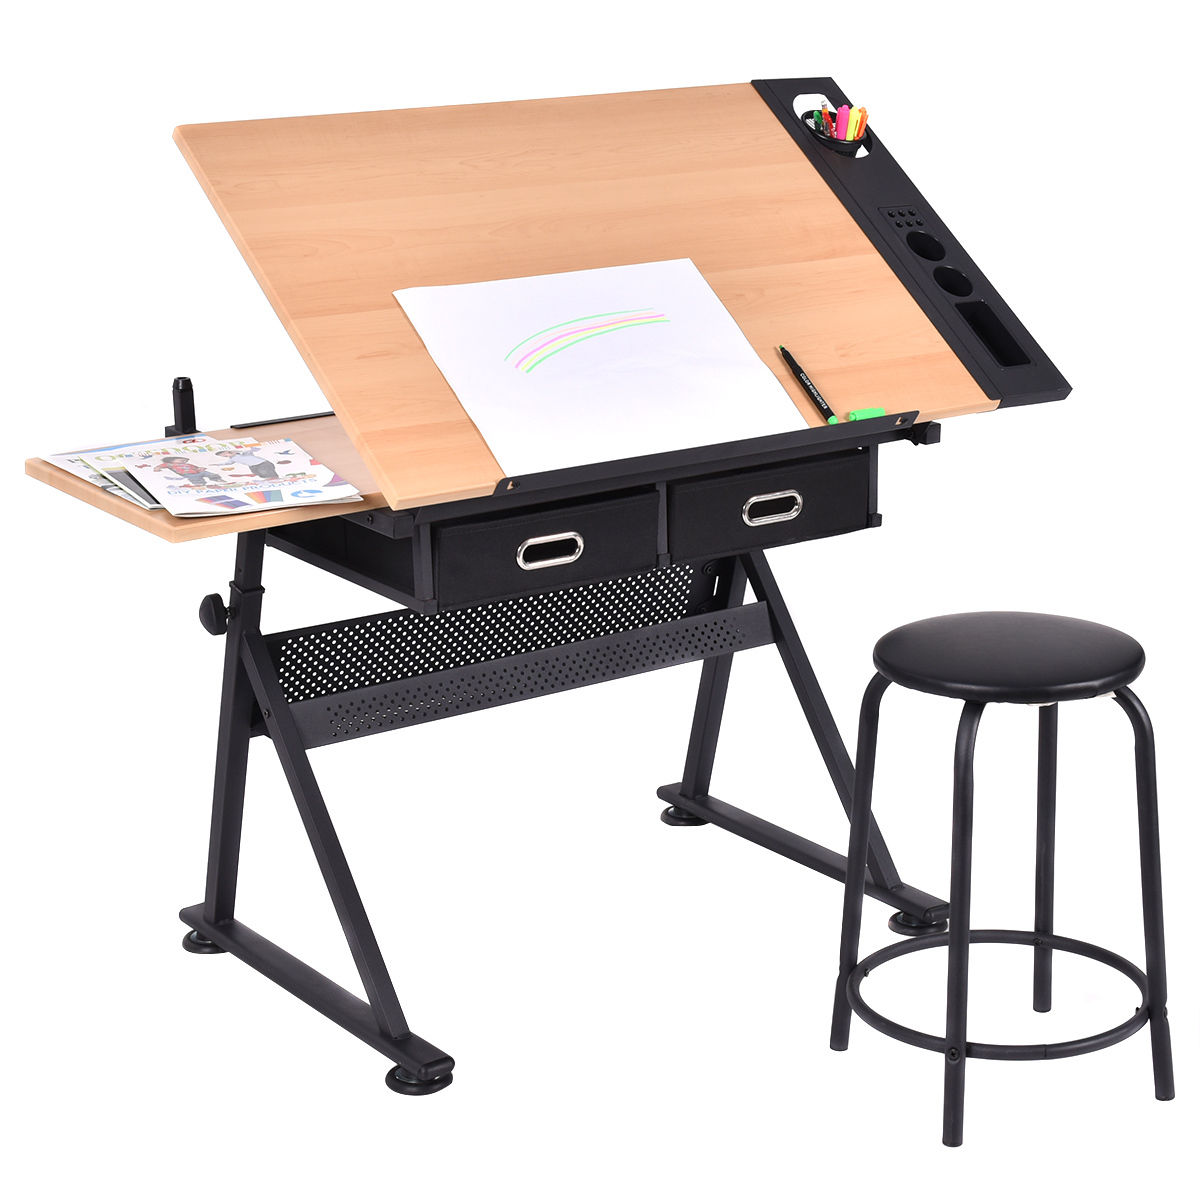 Costway Adjustable Drafting Table Art Craft Drawing Desk